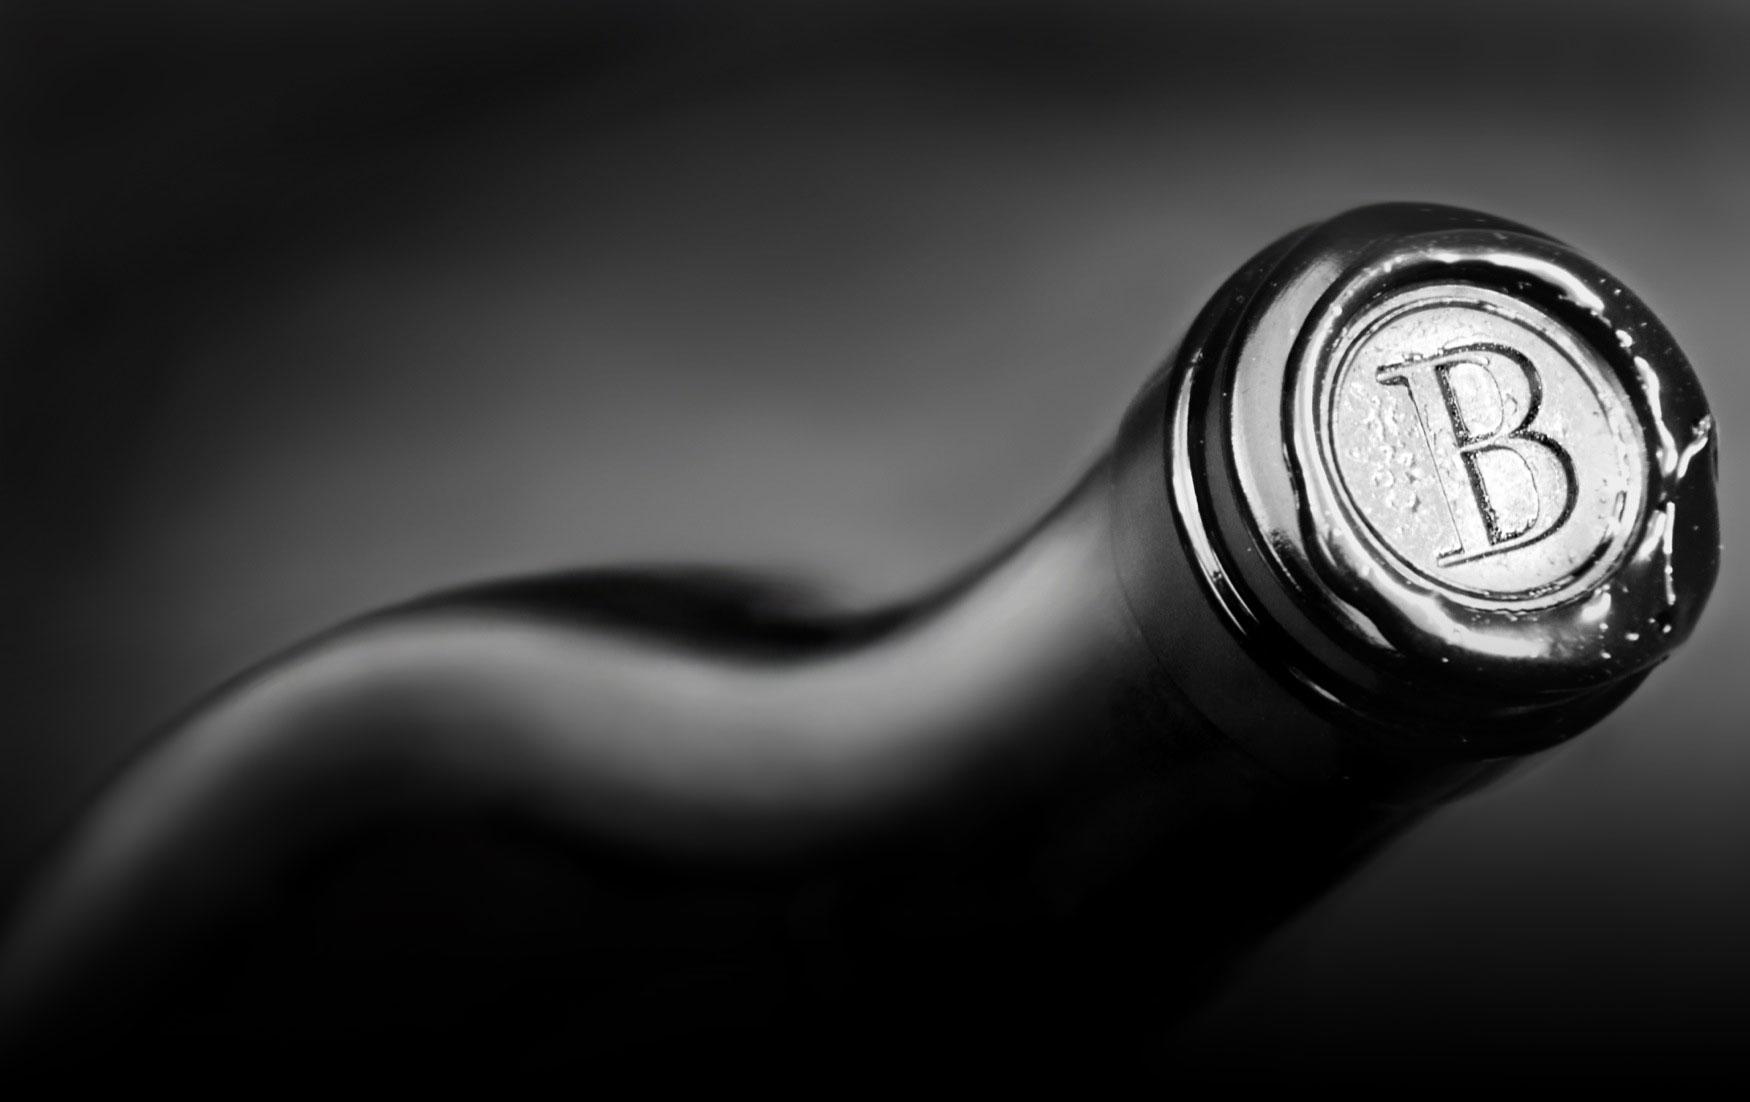 Boich Family Cellar bottle capsule close-up